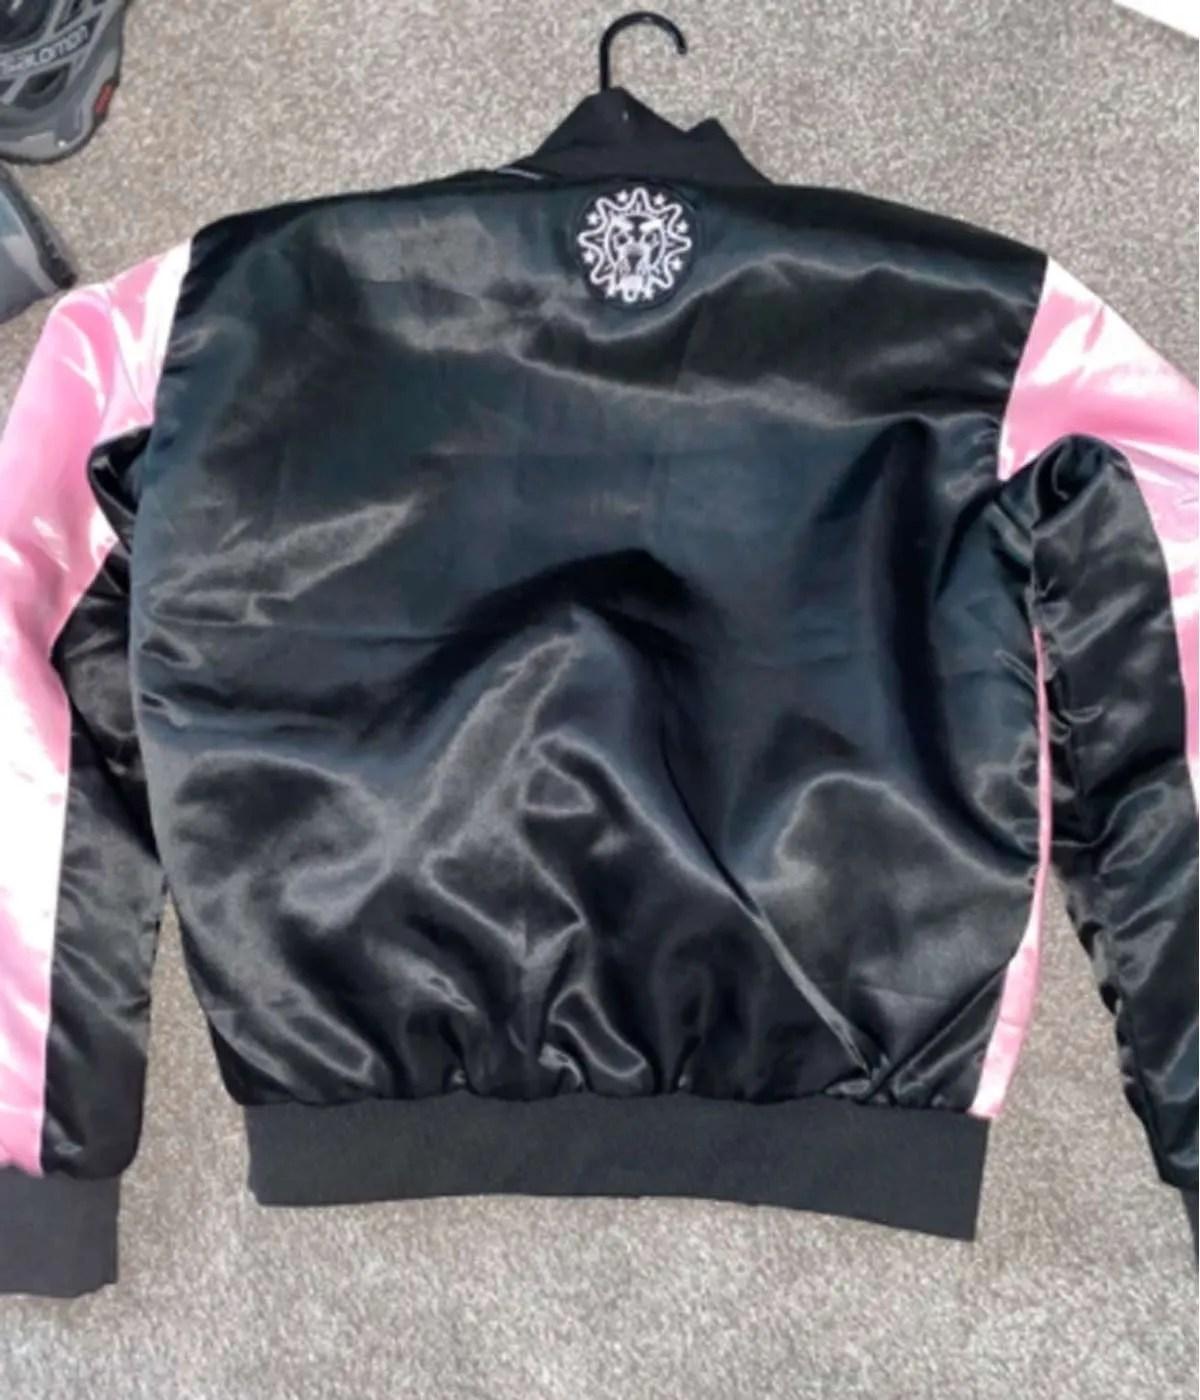 glo-gang-fool-ya-bomber-jacket